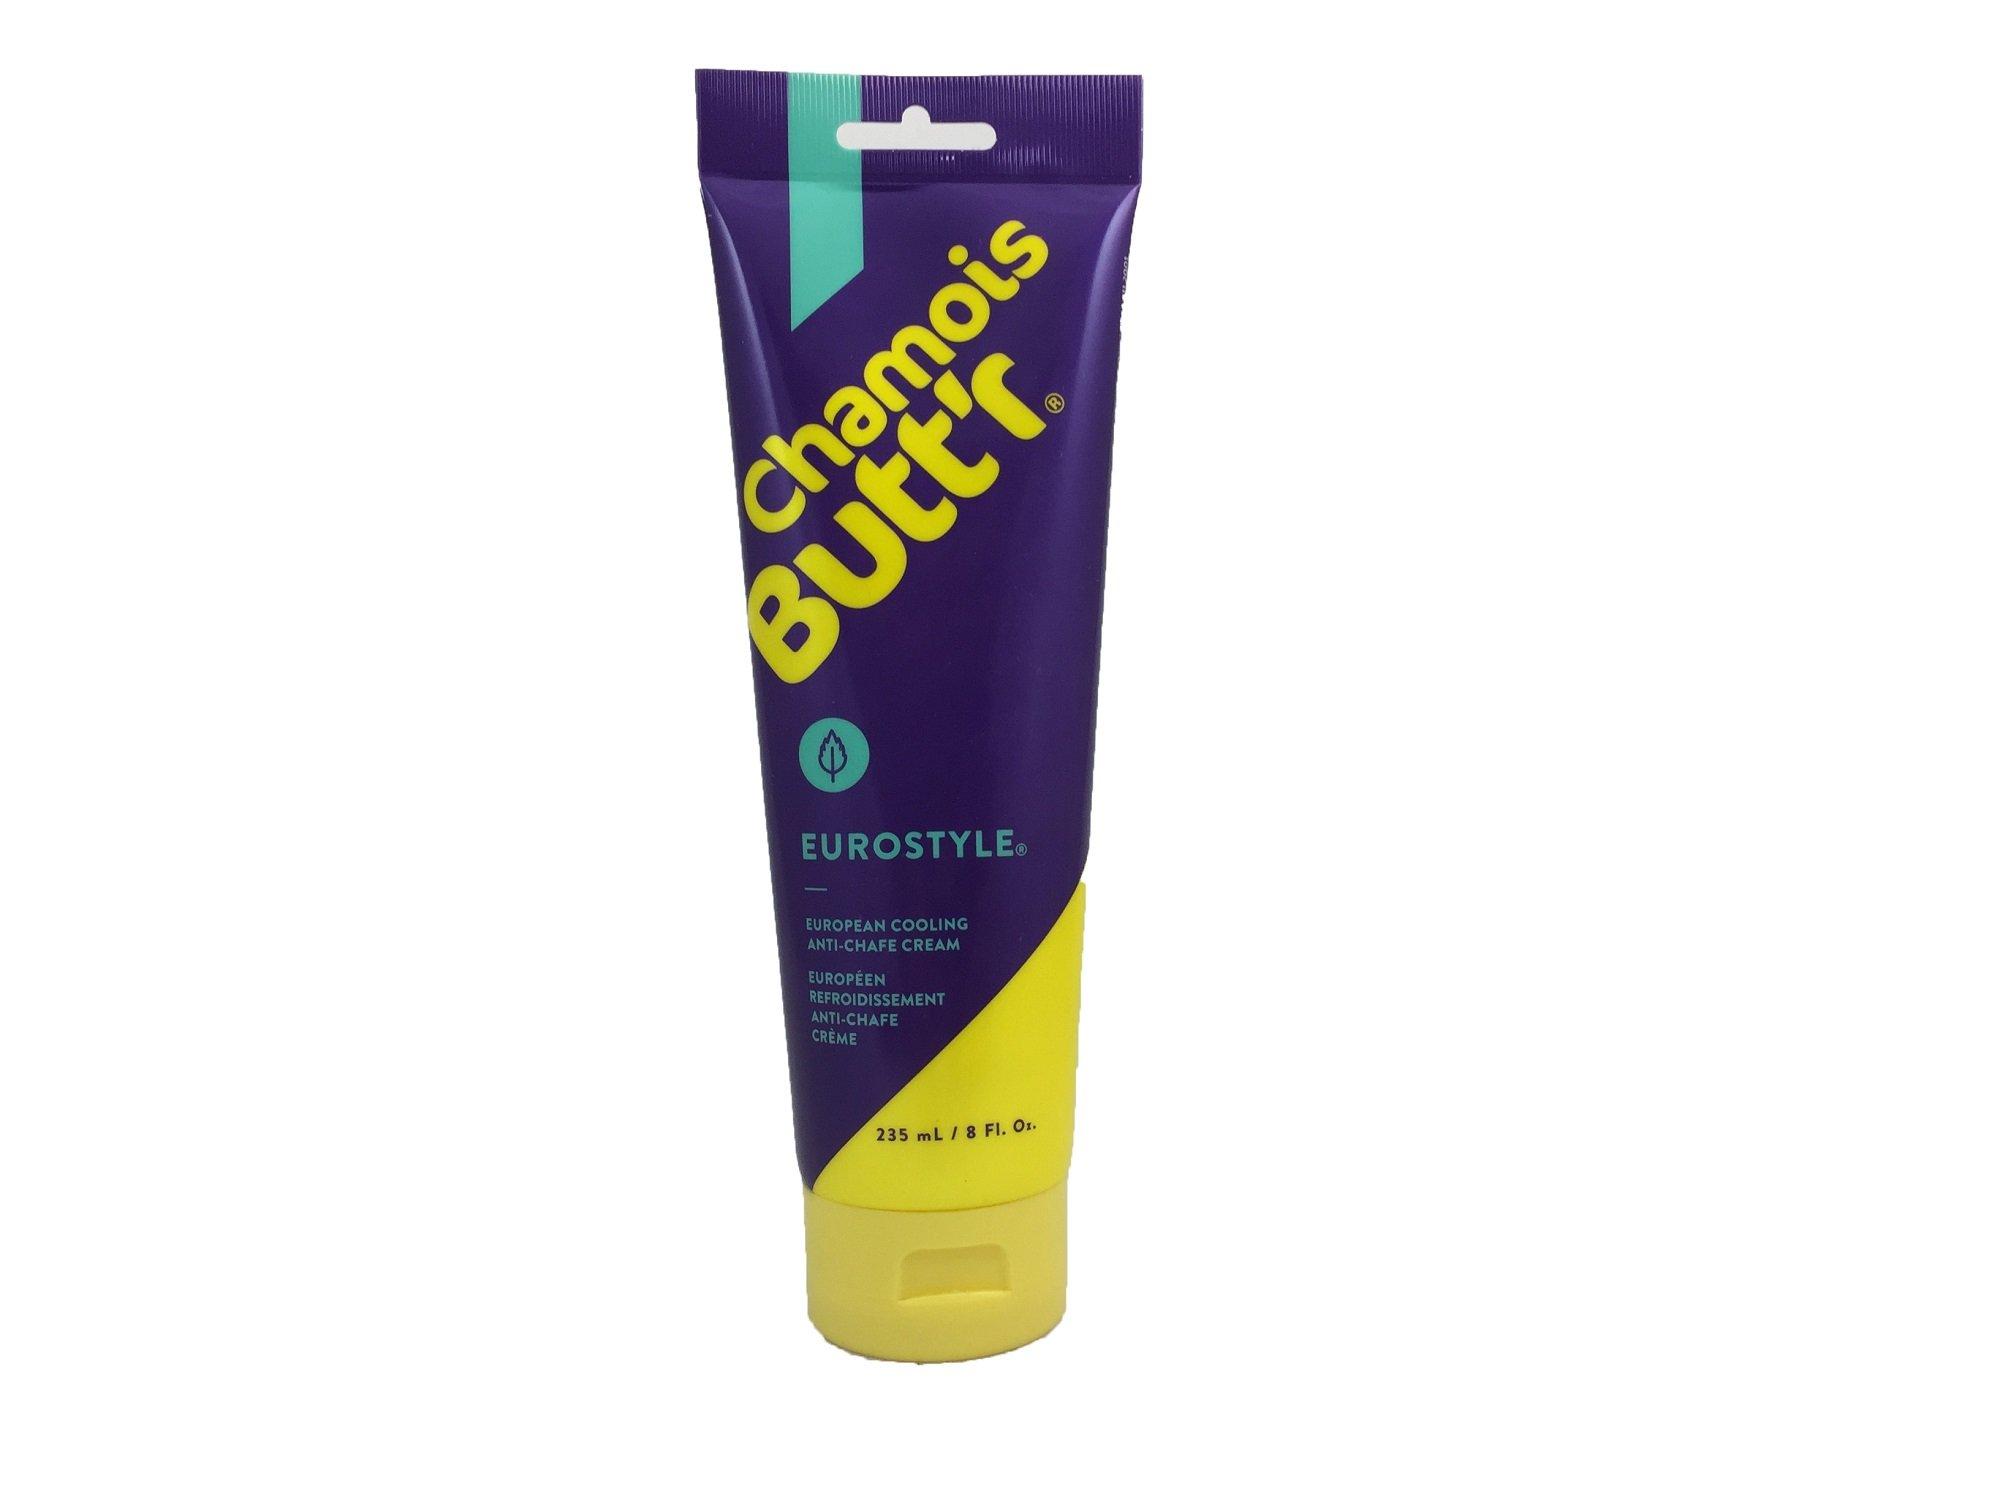 Chamois Butt'r Eurostyle Anti-Chafe Cream, 8 ounce tube